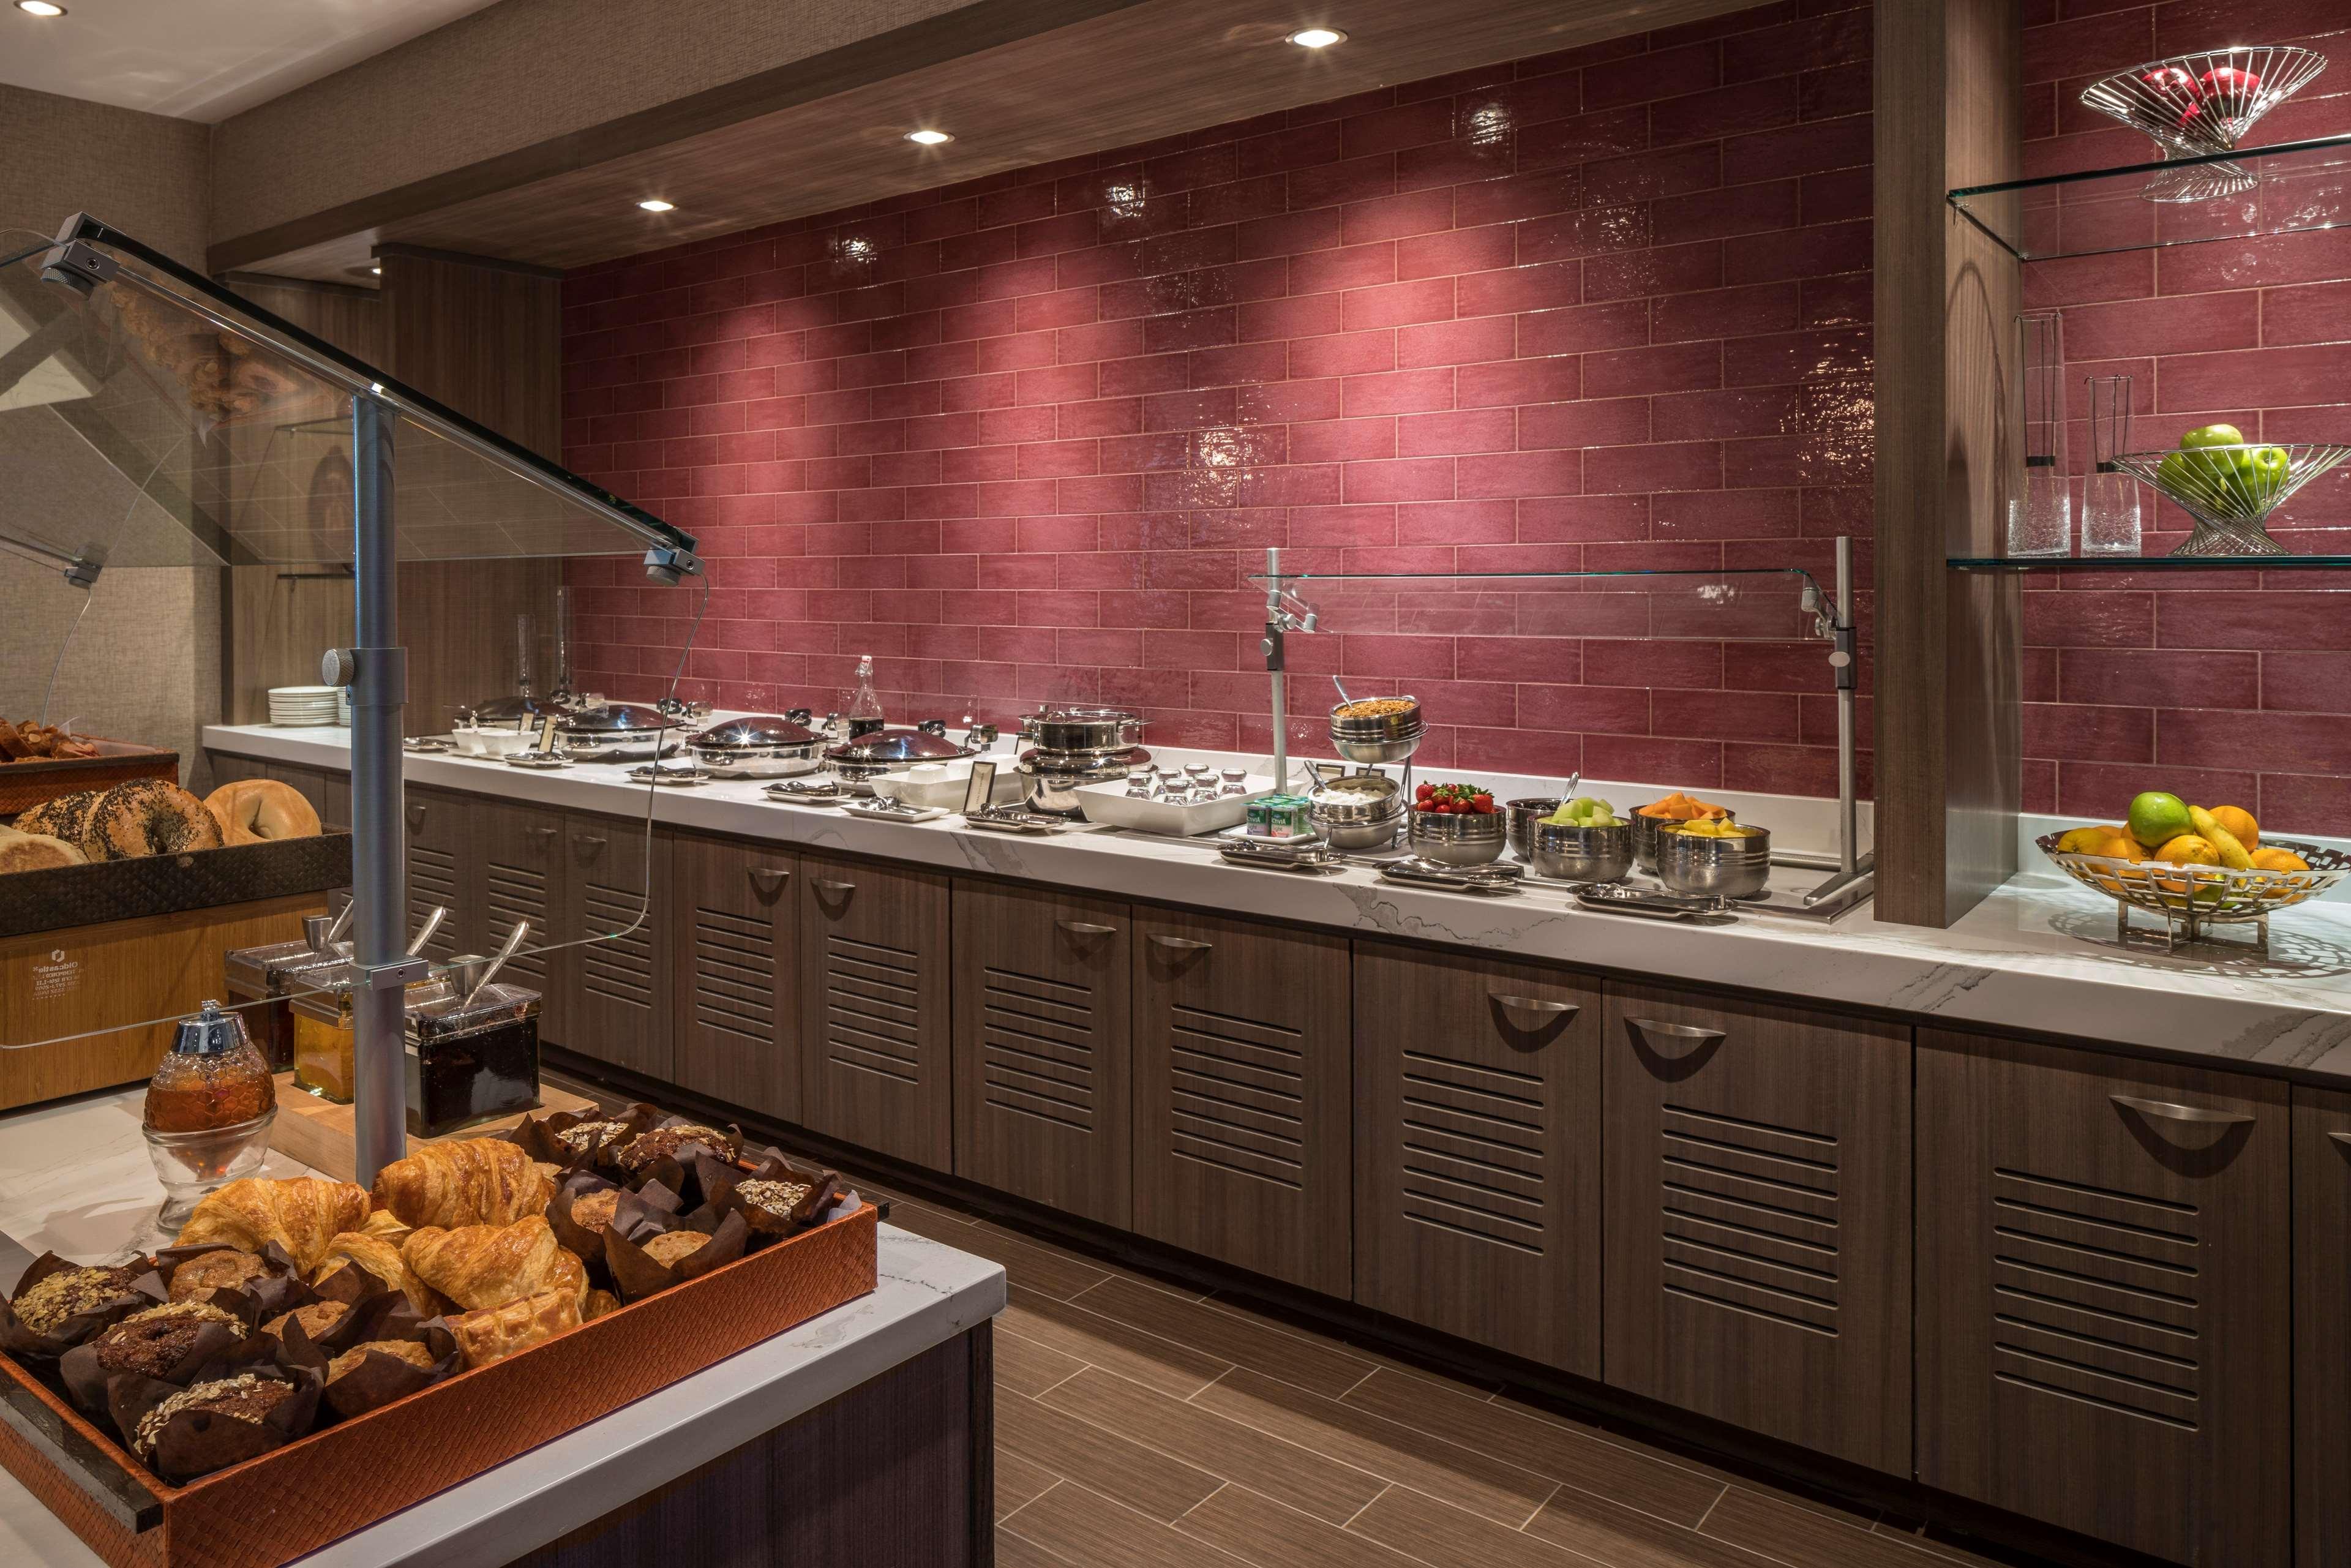 Hilton Washington DC/Rockville Hotel & Executive Meeting Ctr image 17